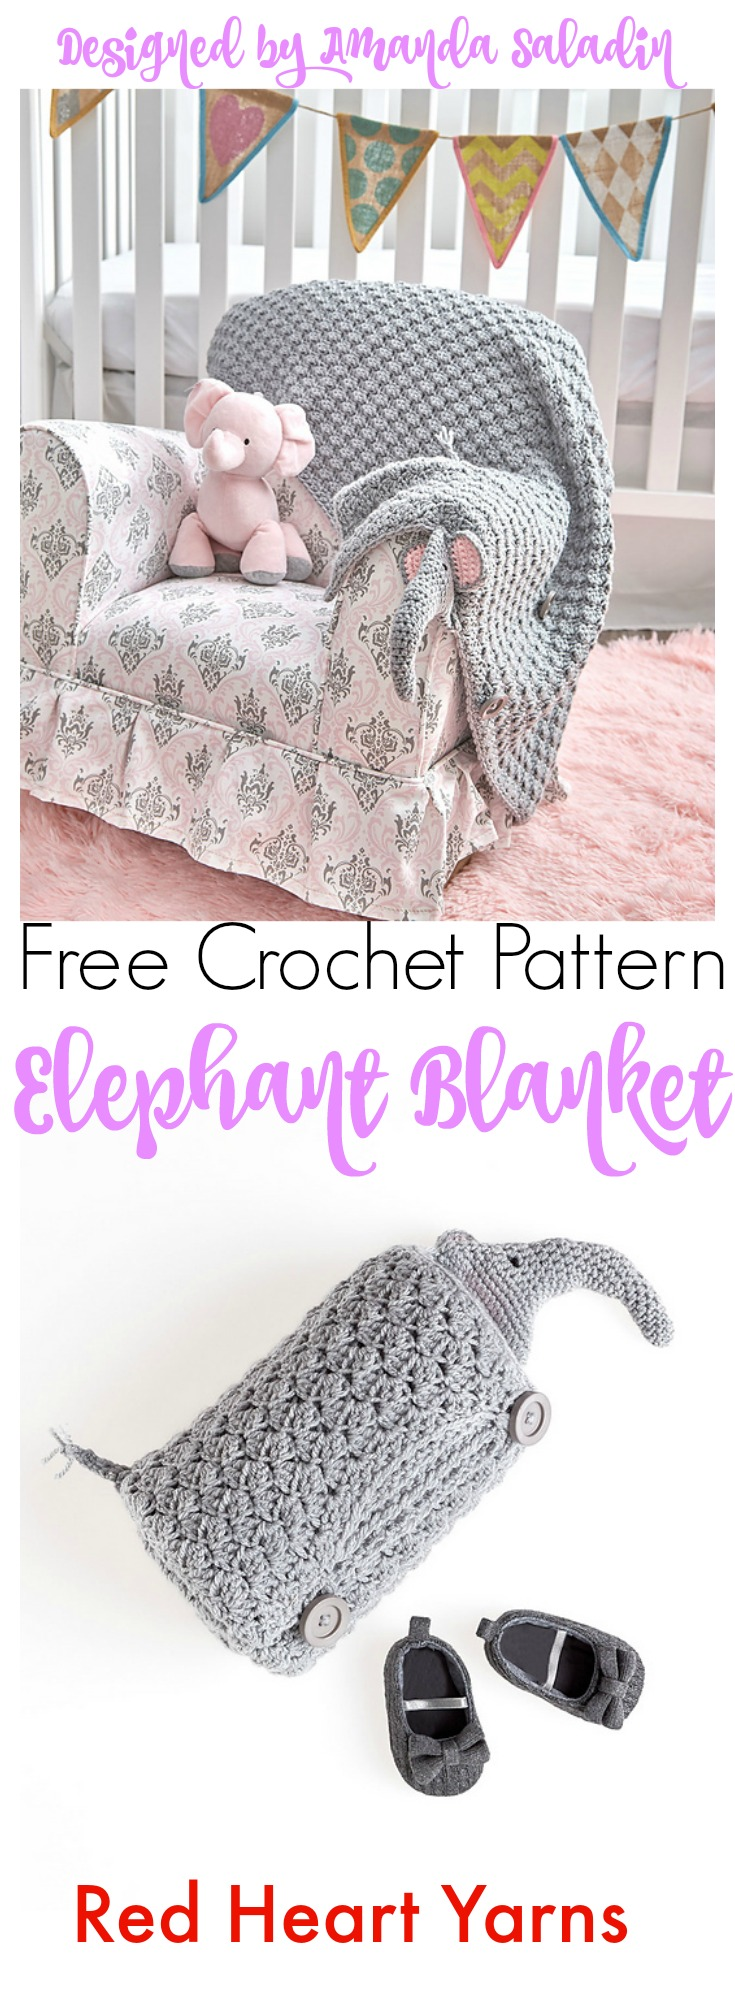 Elephant Blanket - Free Crochet Pattern - Amanda Saladin